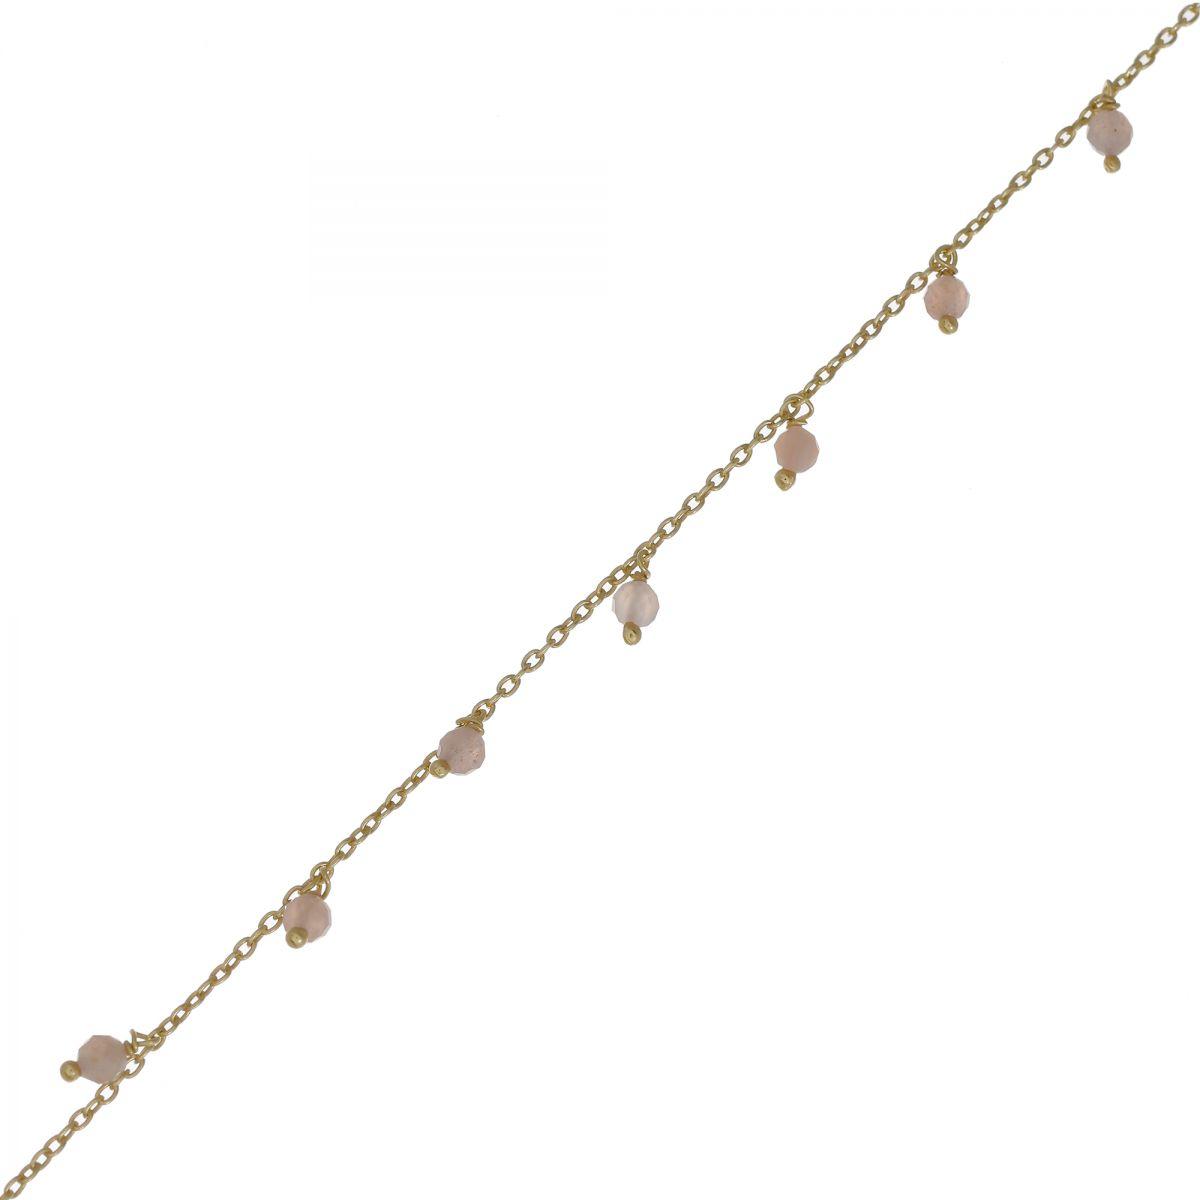 f bracelet 3mm 8 pendants peach moonstone beads g pl